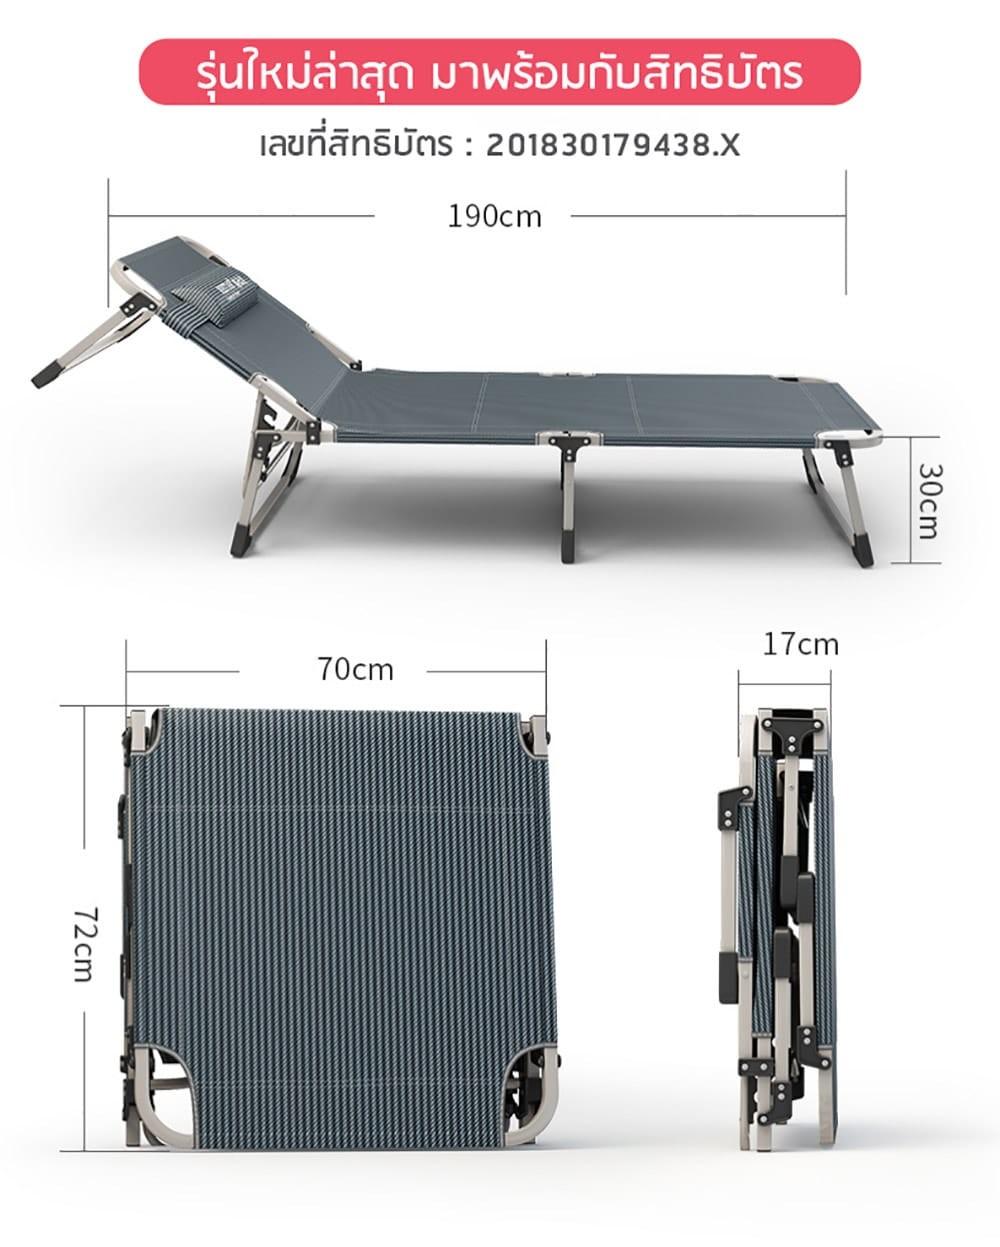 04-fu01-rs13-bk-4-12.jpg